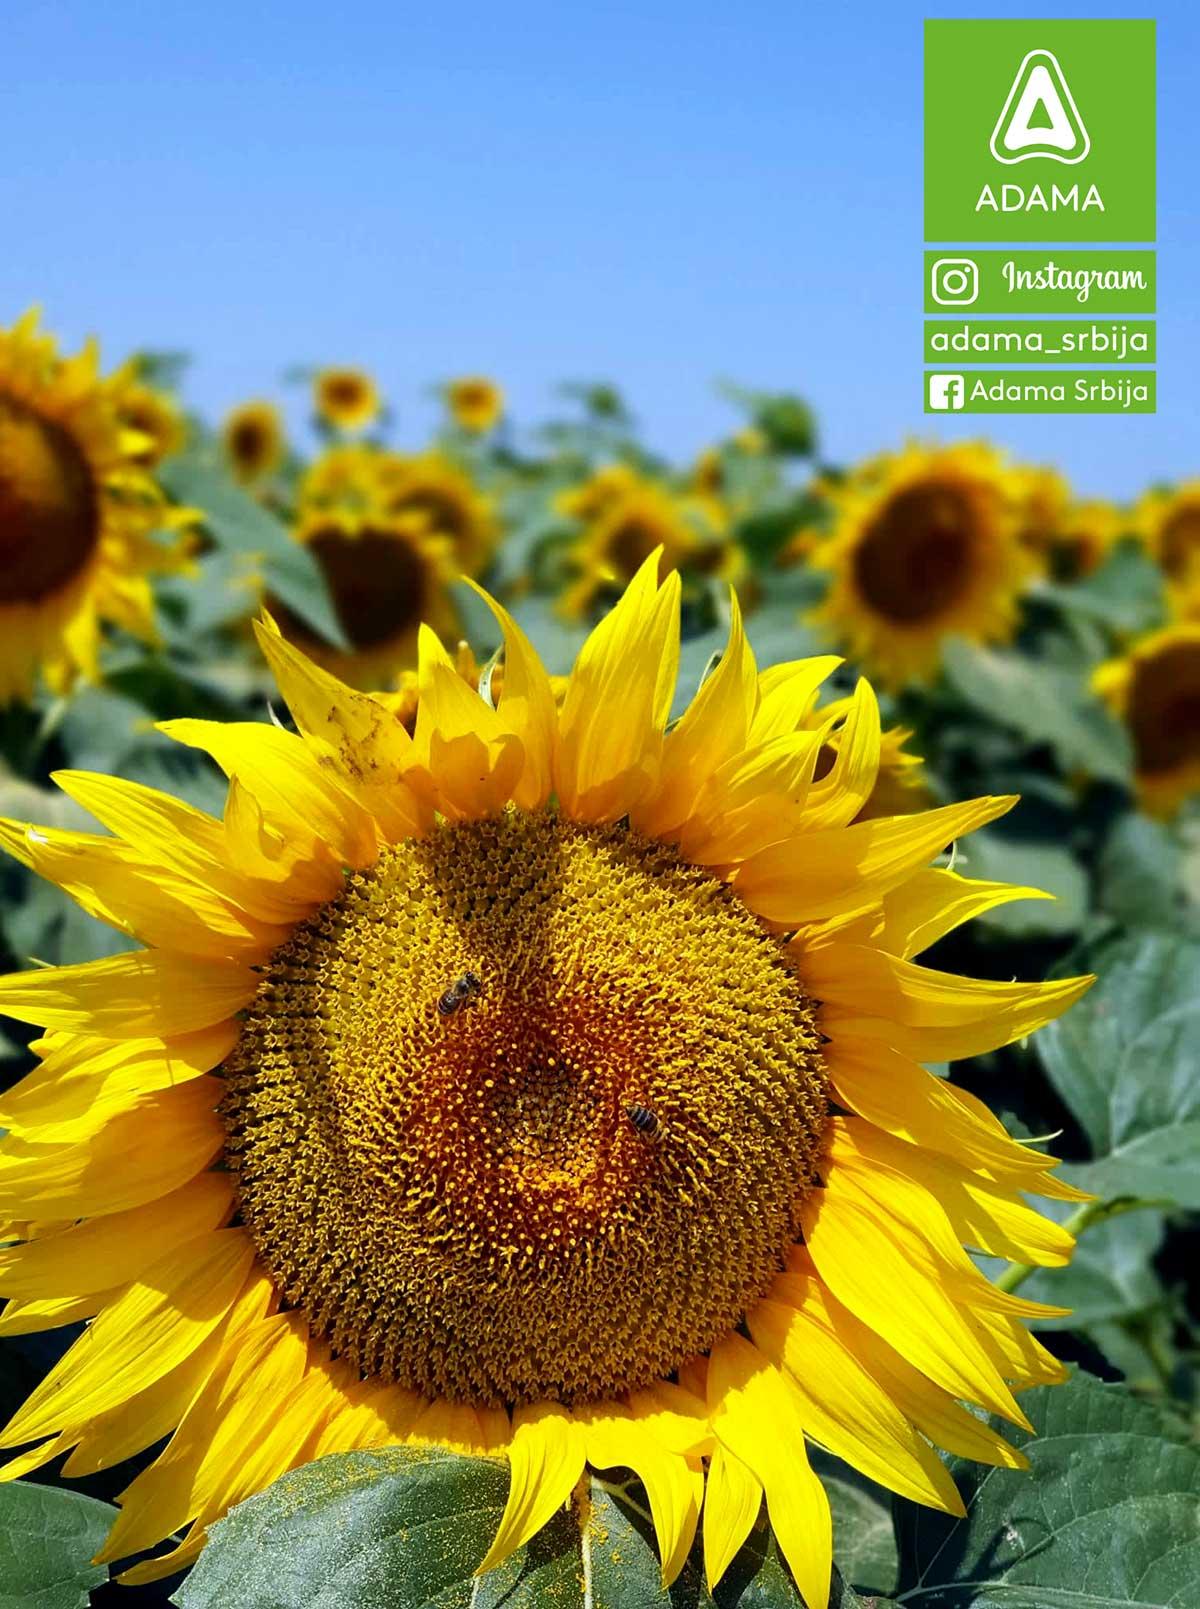 Agrosaveti---Adama---kukukuruz---suncokret---psenica---Milan-Markov---Fotkaj-plod-i-uvecaj-rod---Konkurs-03